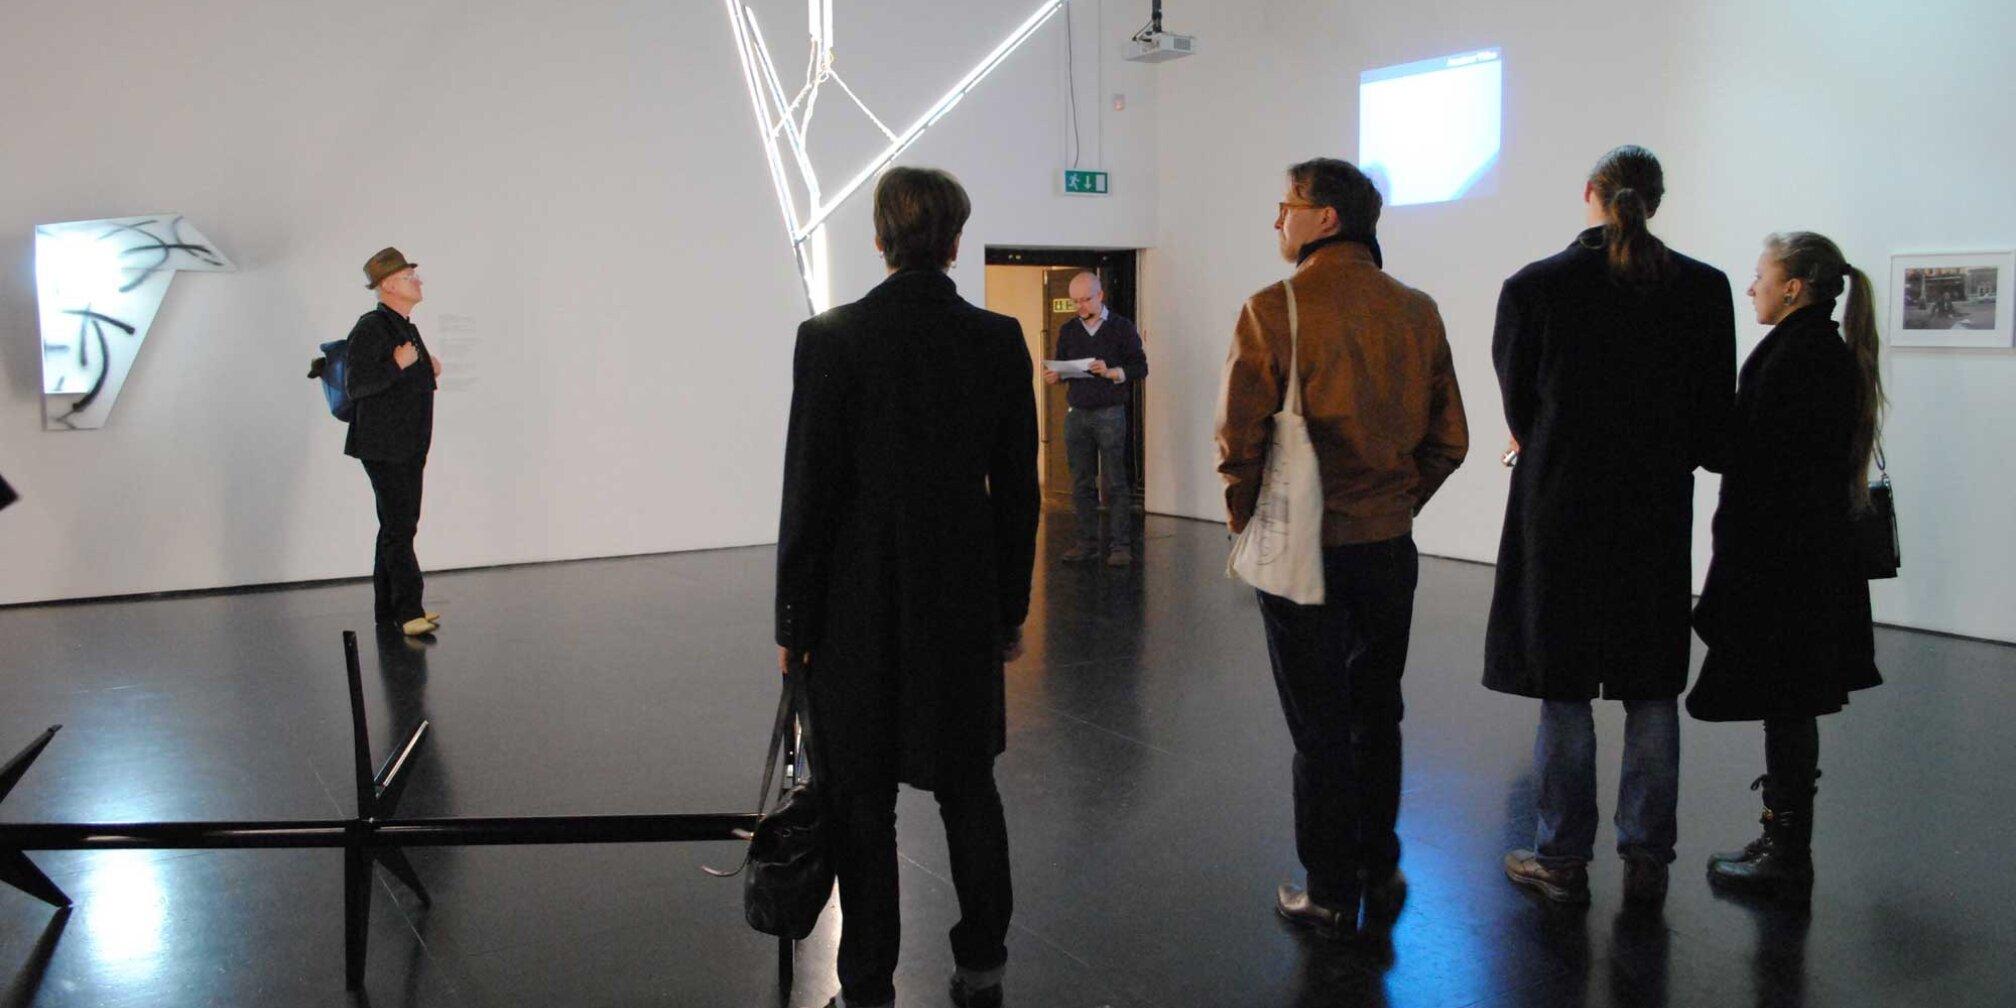 Eternal City an event with artist John Timberlake, 2014, Zabludowicz Collection, London.